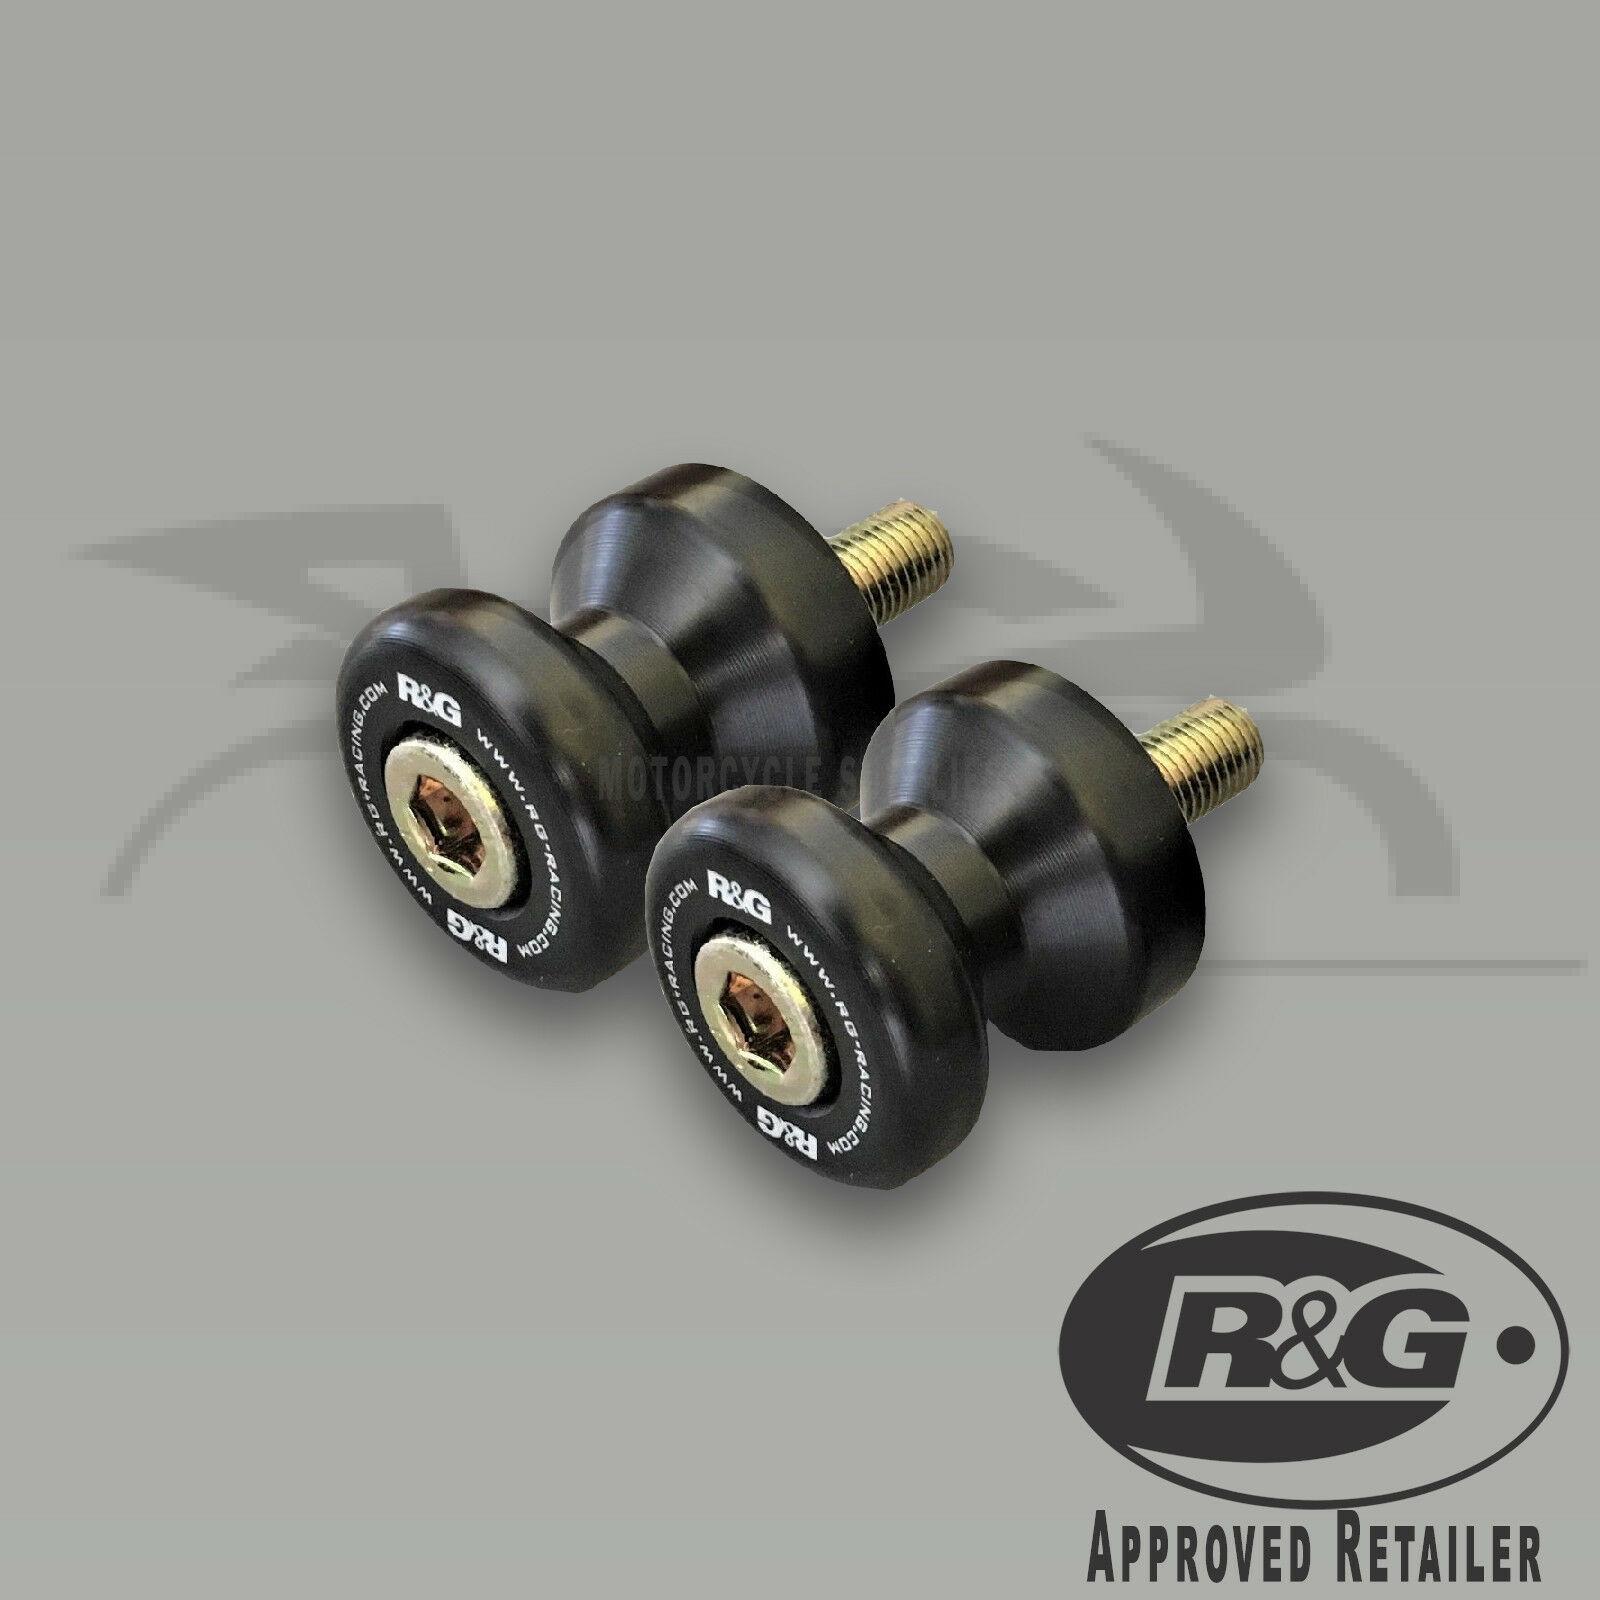 Suzuki-GSX1300R-Hayabusa-2011-L1-R-amp-G-Racing-Cotton-Reels-Paddock-Stand-Bobbins